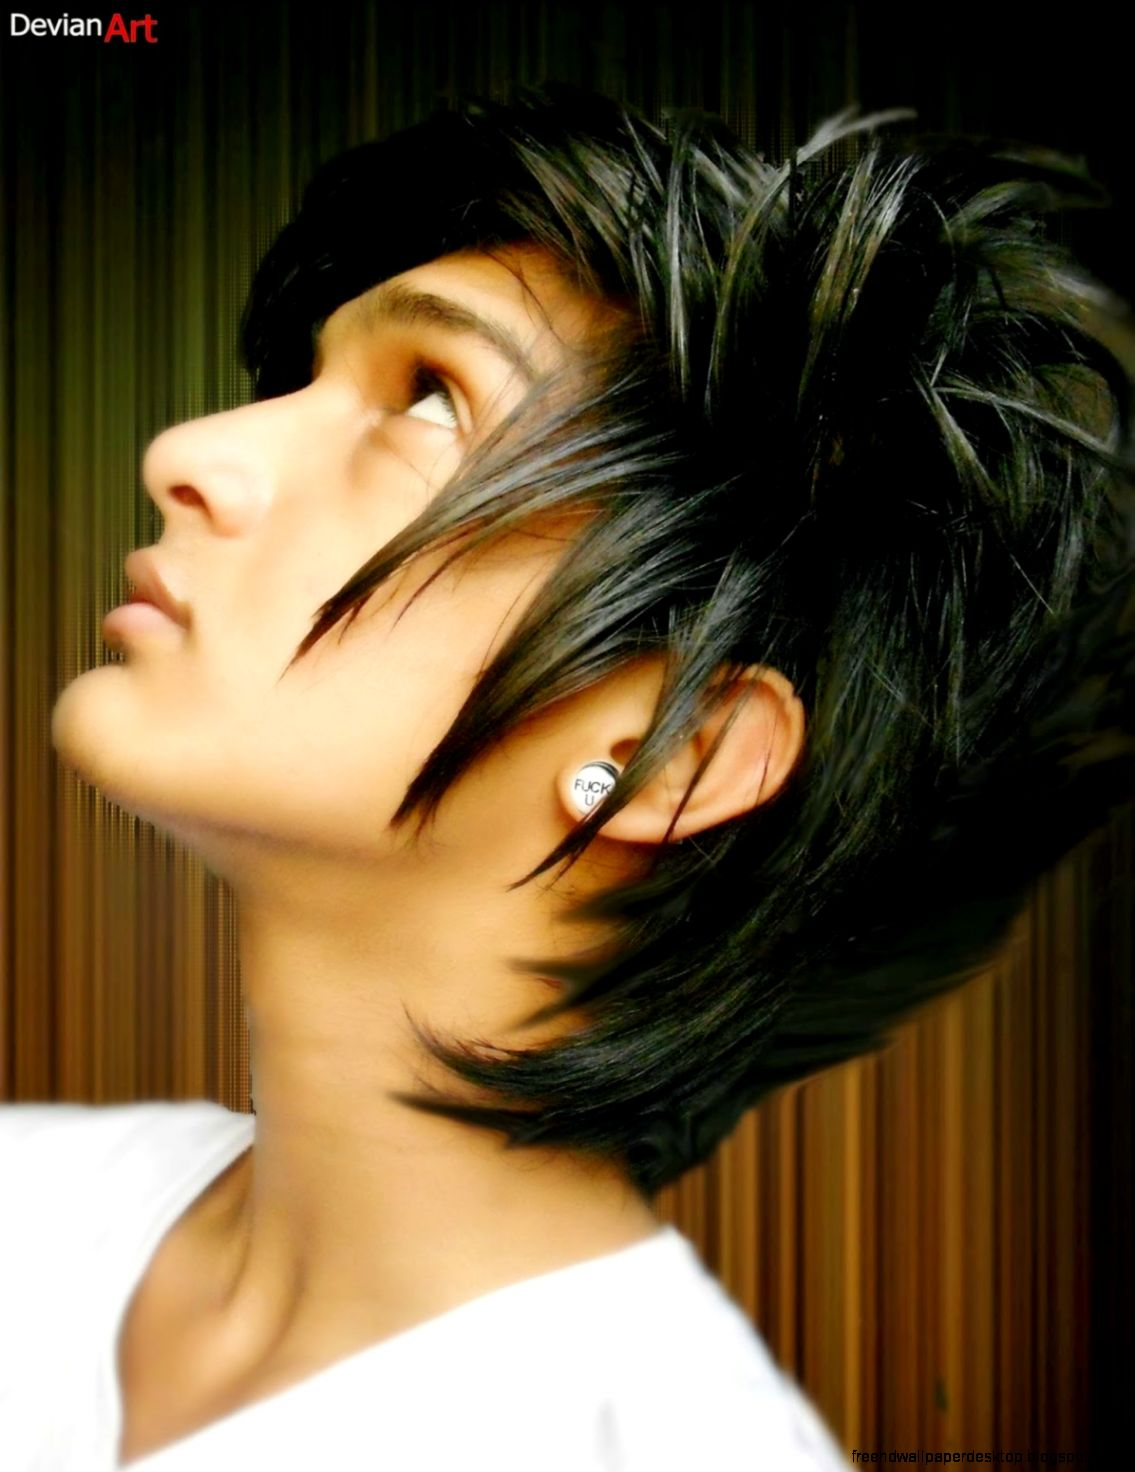 Pleasing Emo Boy Sam Llansing Hairstyles Free High Definition Wallpapers Hairstyles For Women Draintrainus